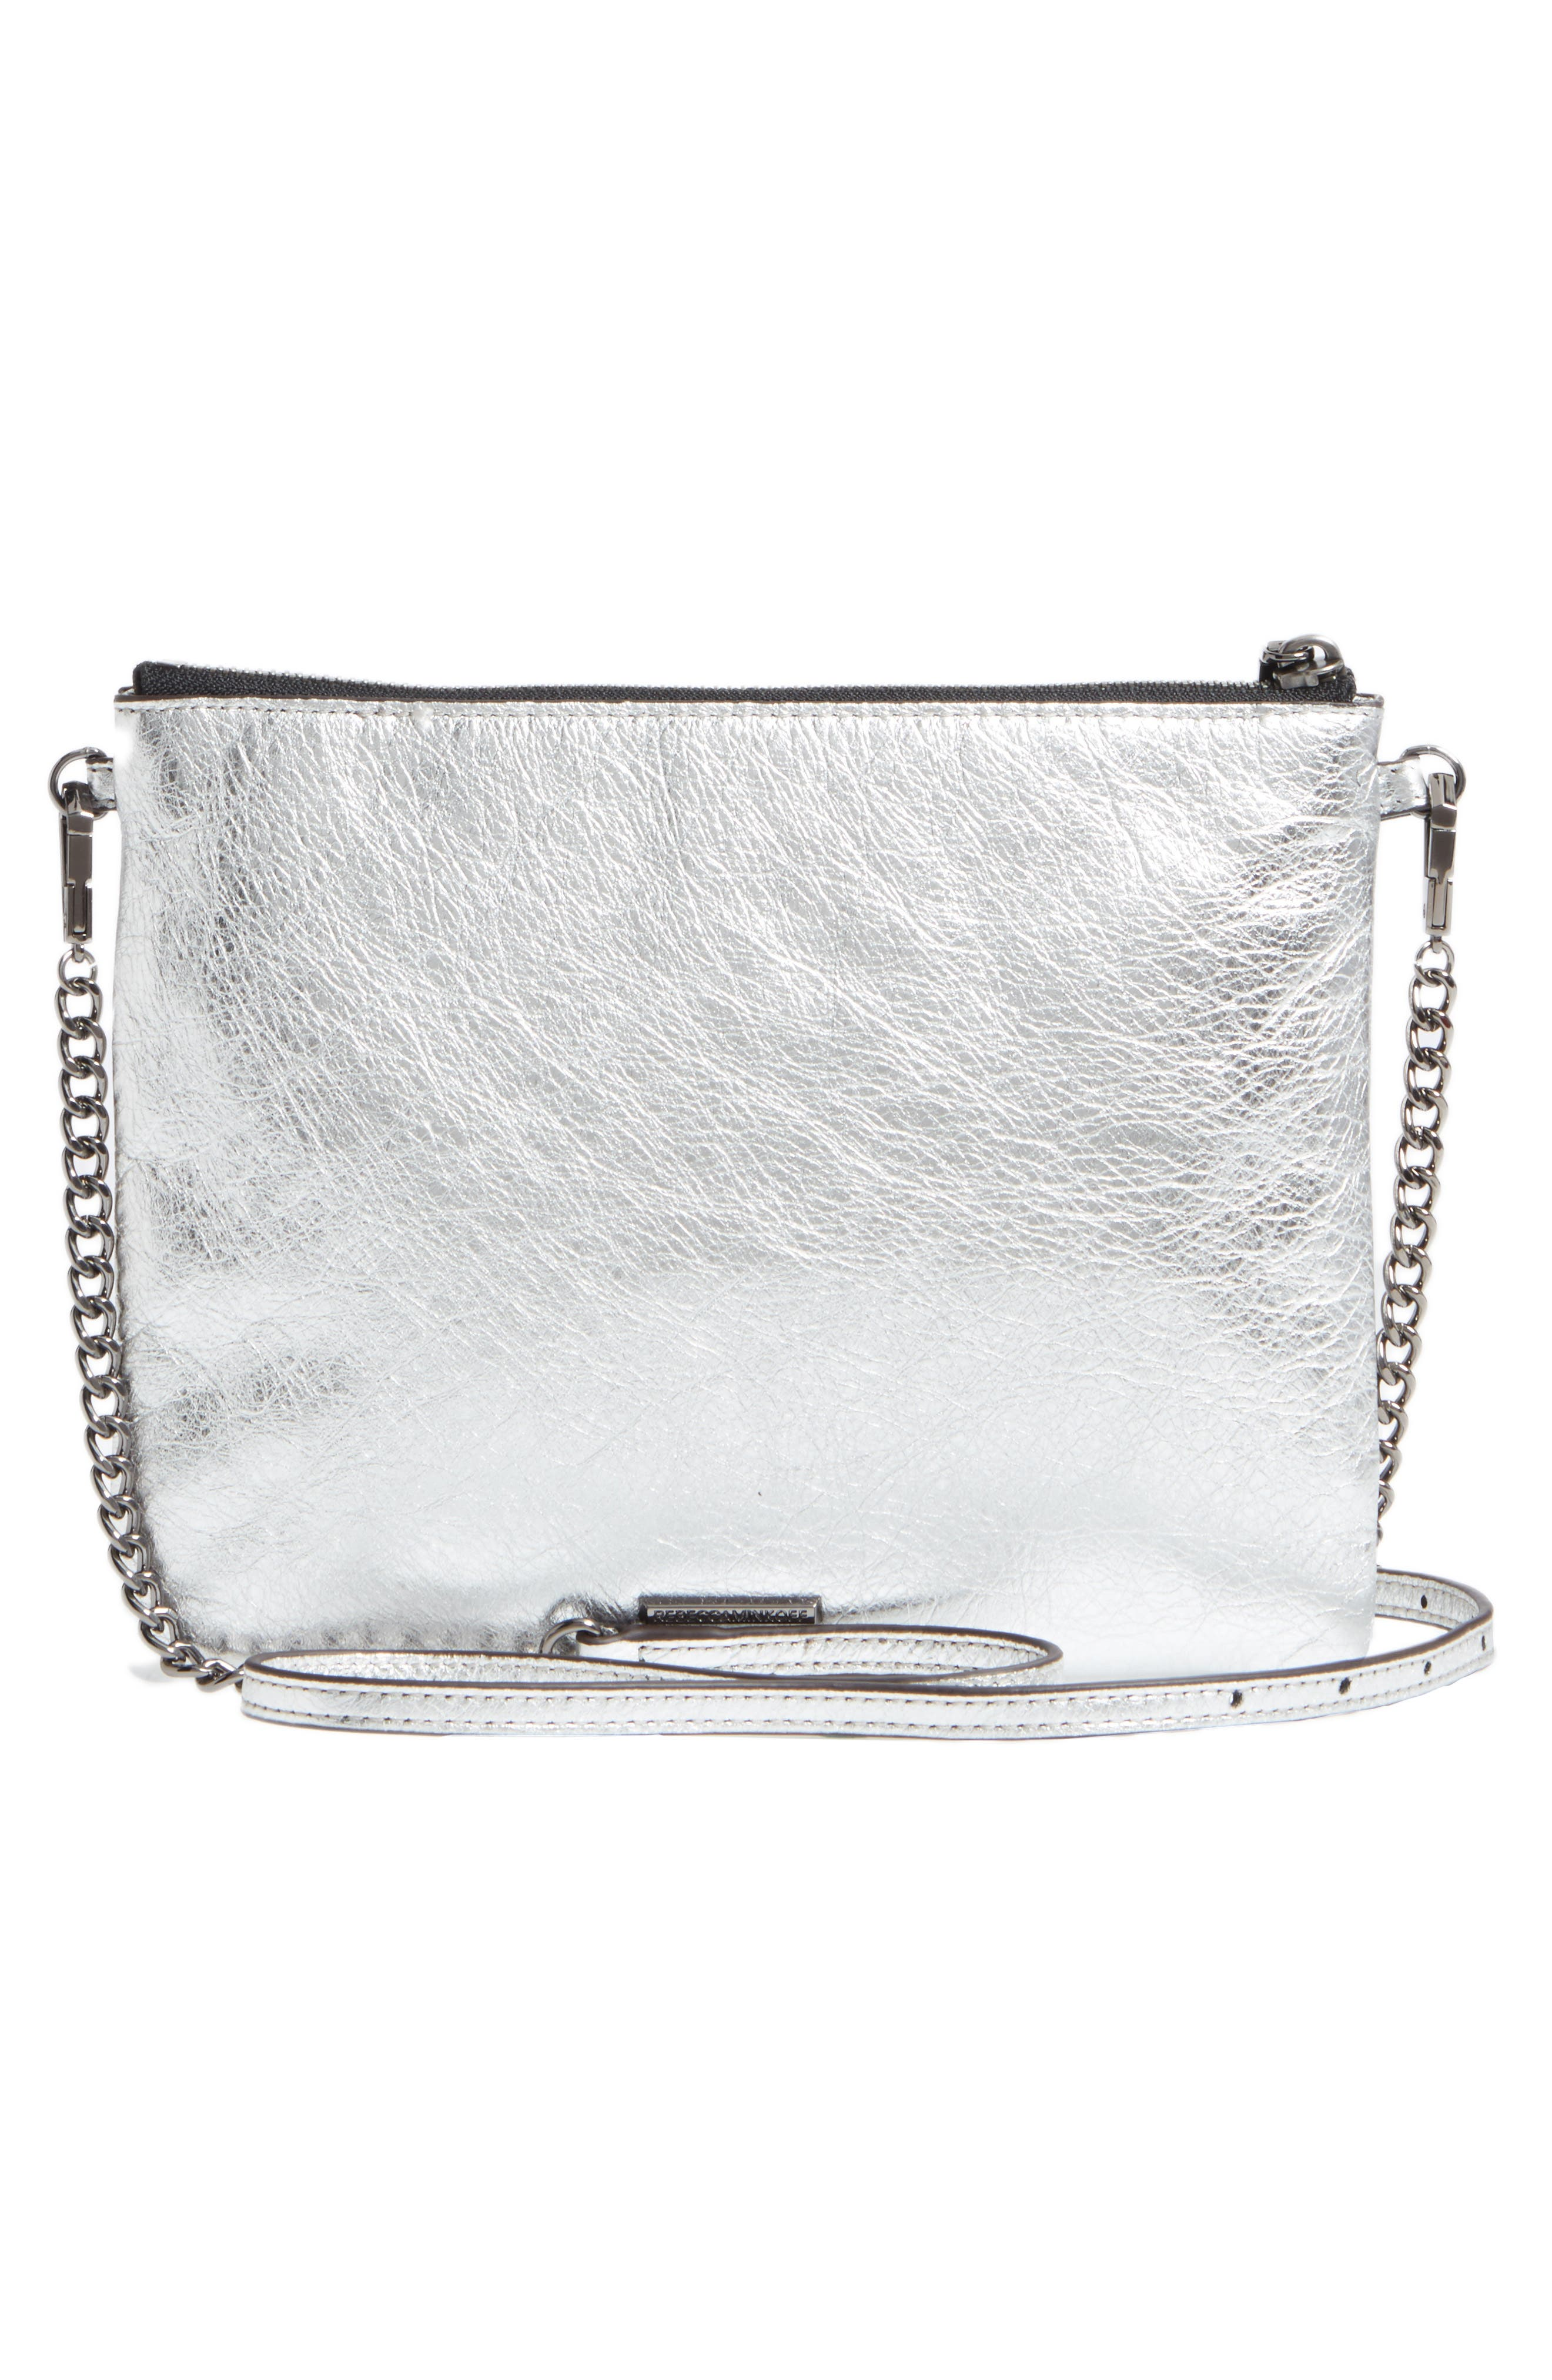 Jon Leather Crossbody Bag,                             Alternate thumbnail 3, color,                             Silver